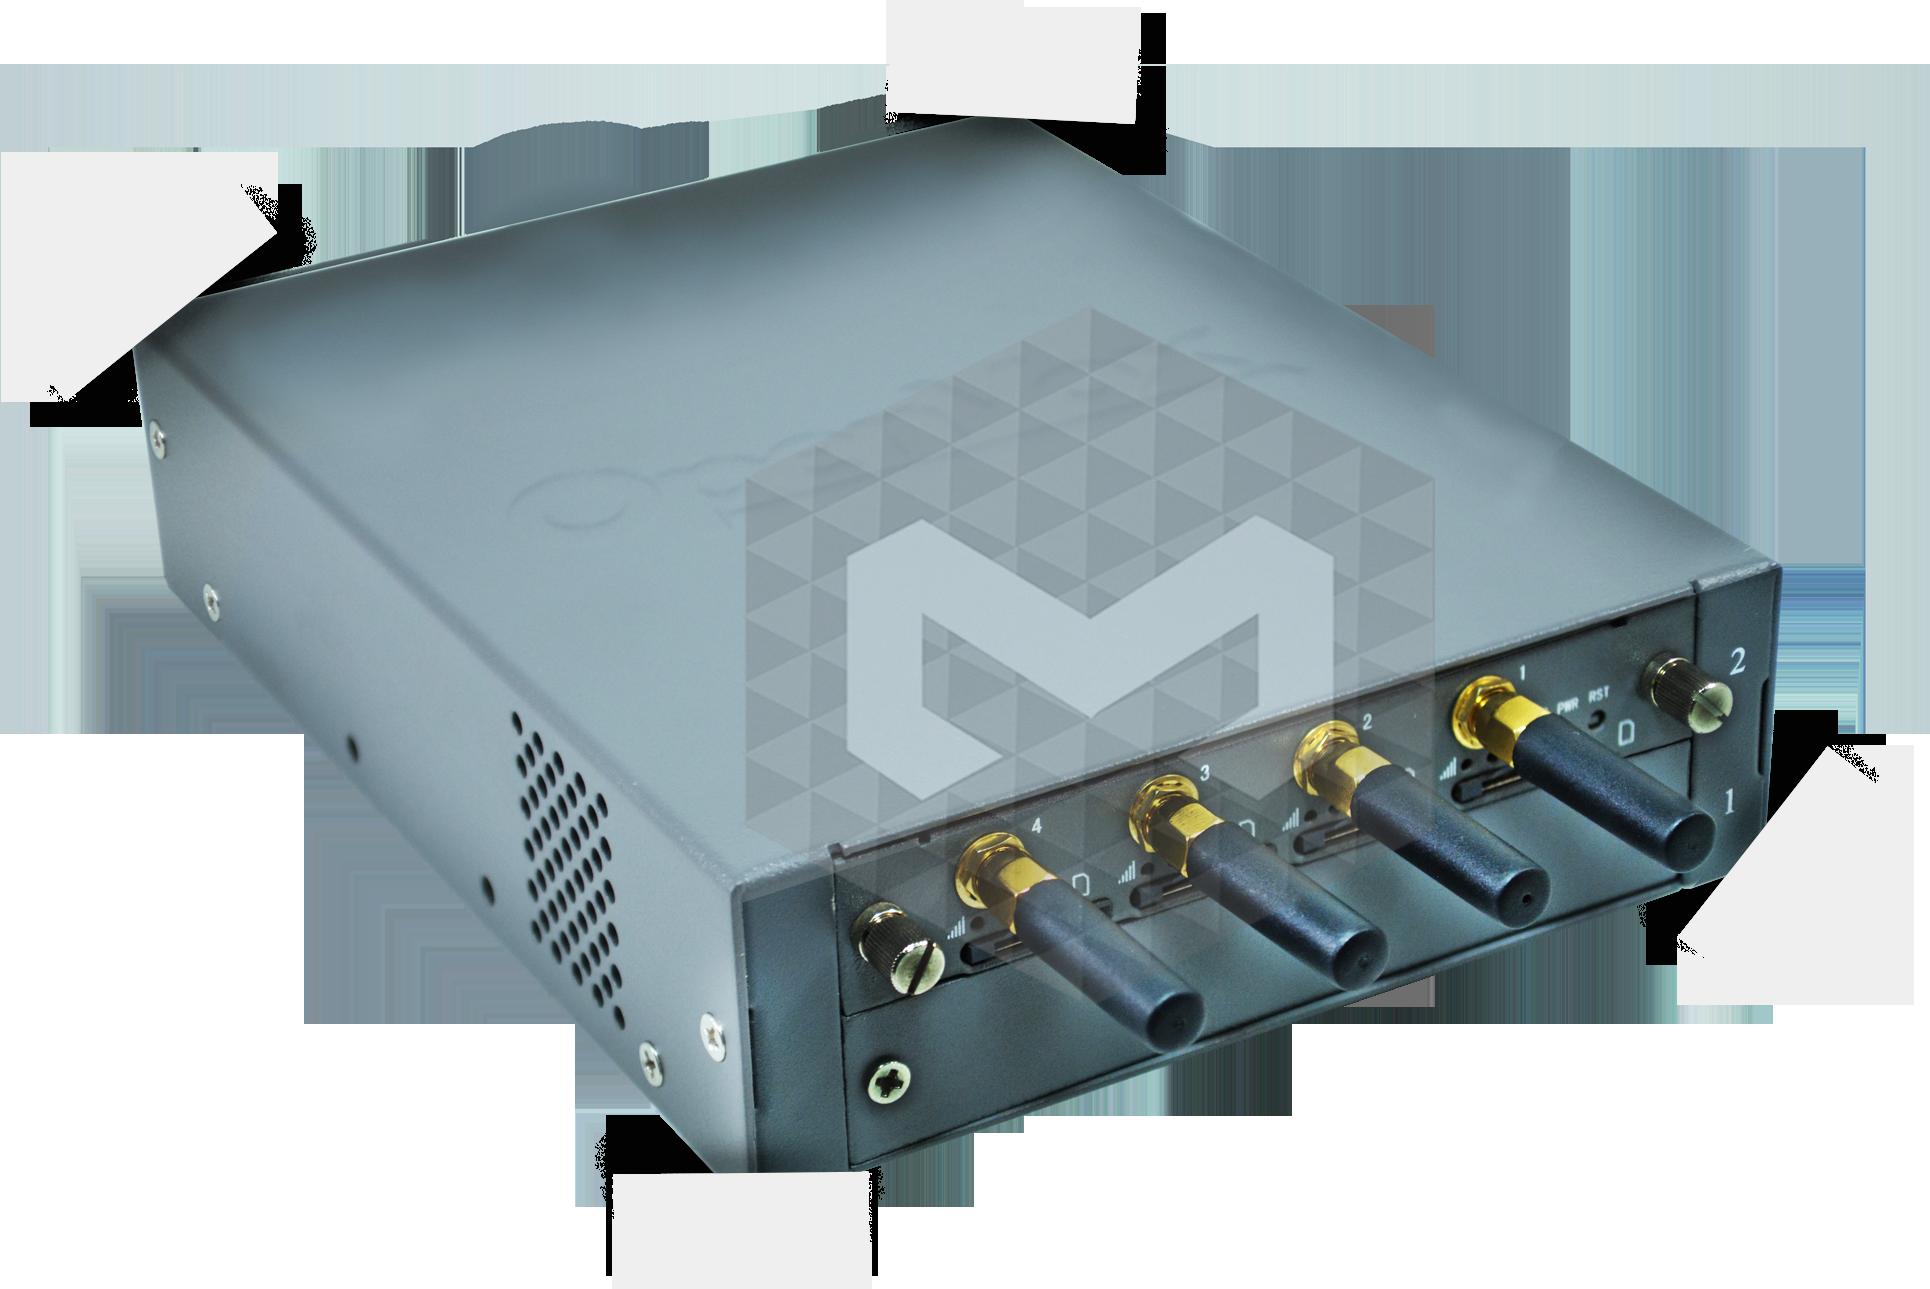 OX-GW1204-4-Portas-3G-GSM